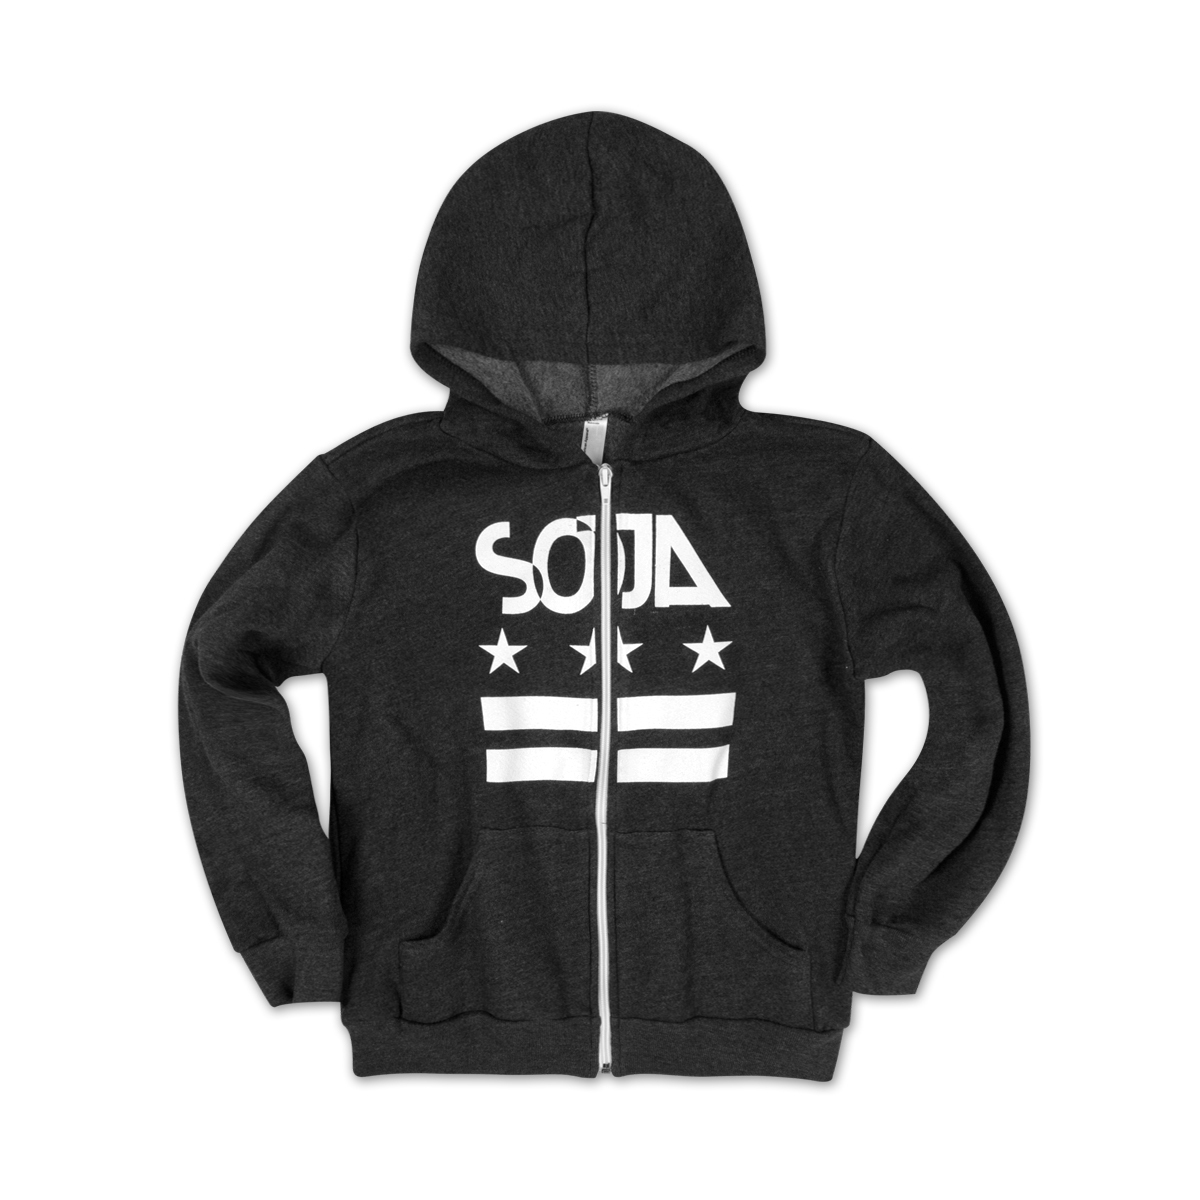 SOJA - Kids/Youth Stars and Bars Hoodie